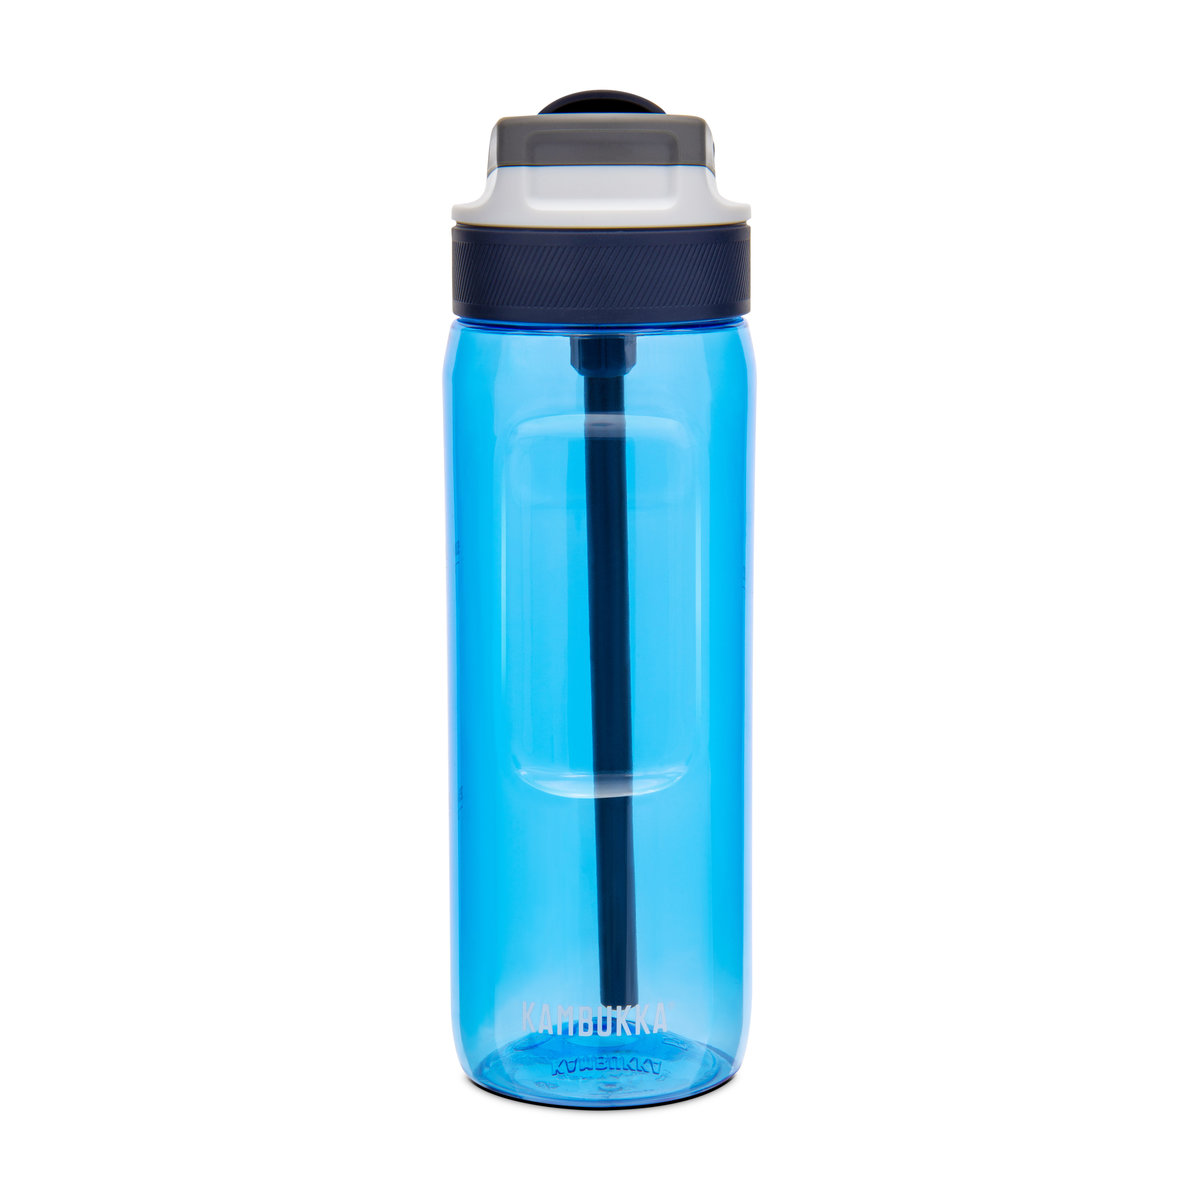 Kambukka 藍湖運動吸管杯 (Tritan) 25oz (750ml) – 皇室藍色